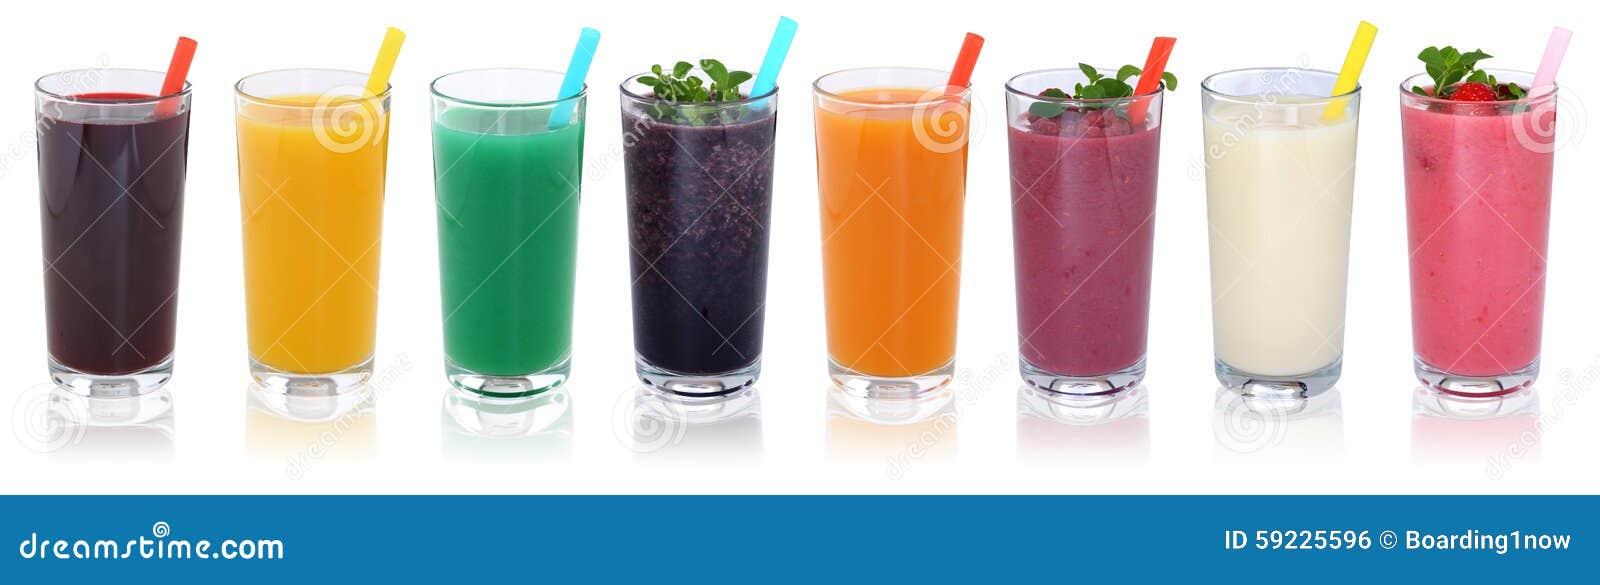 SmoothieFruchtsaft Smoothies trinkt mit Früchte in Folge isola